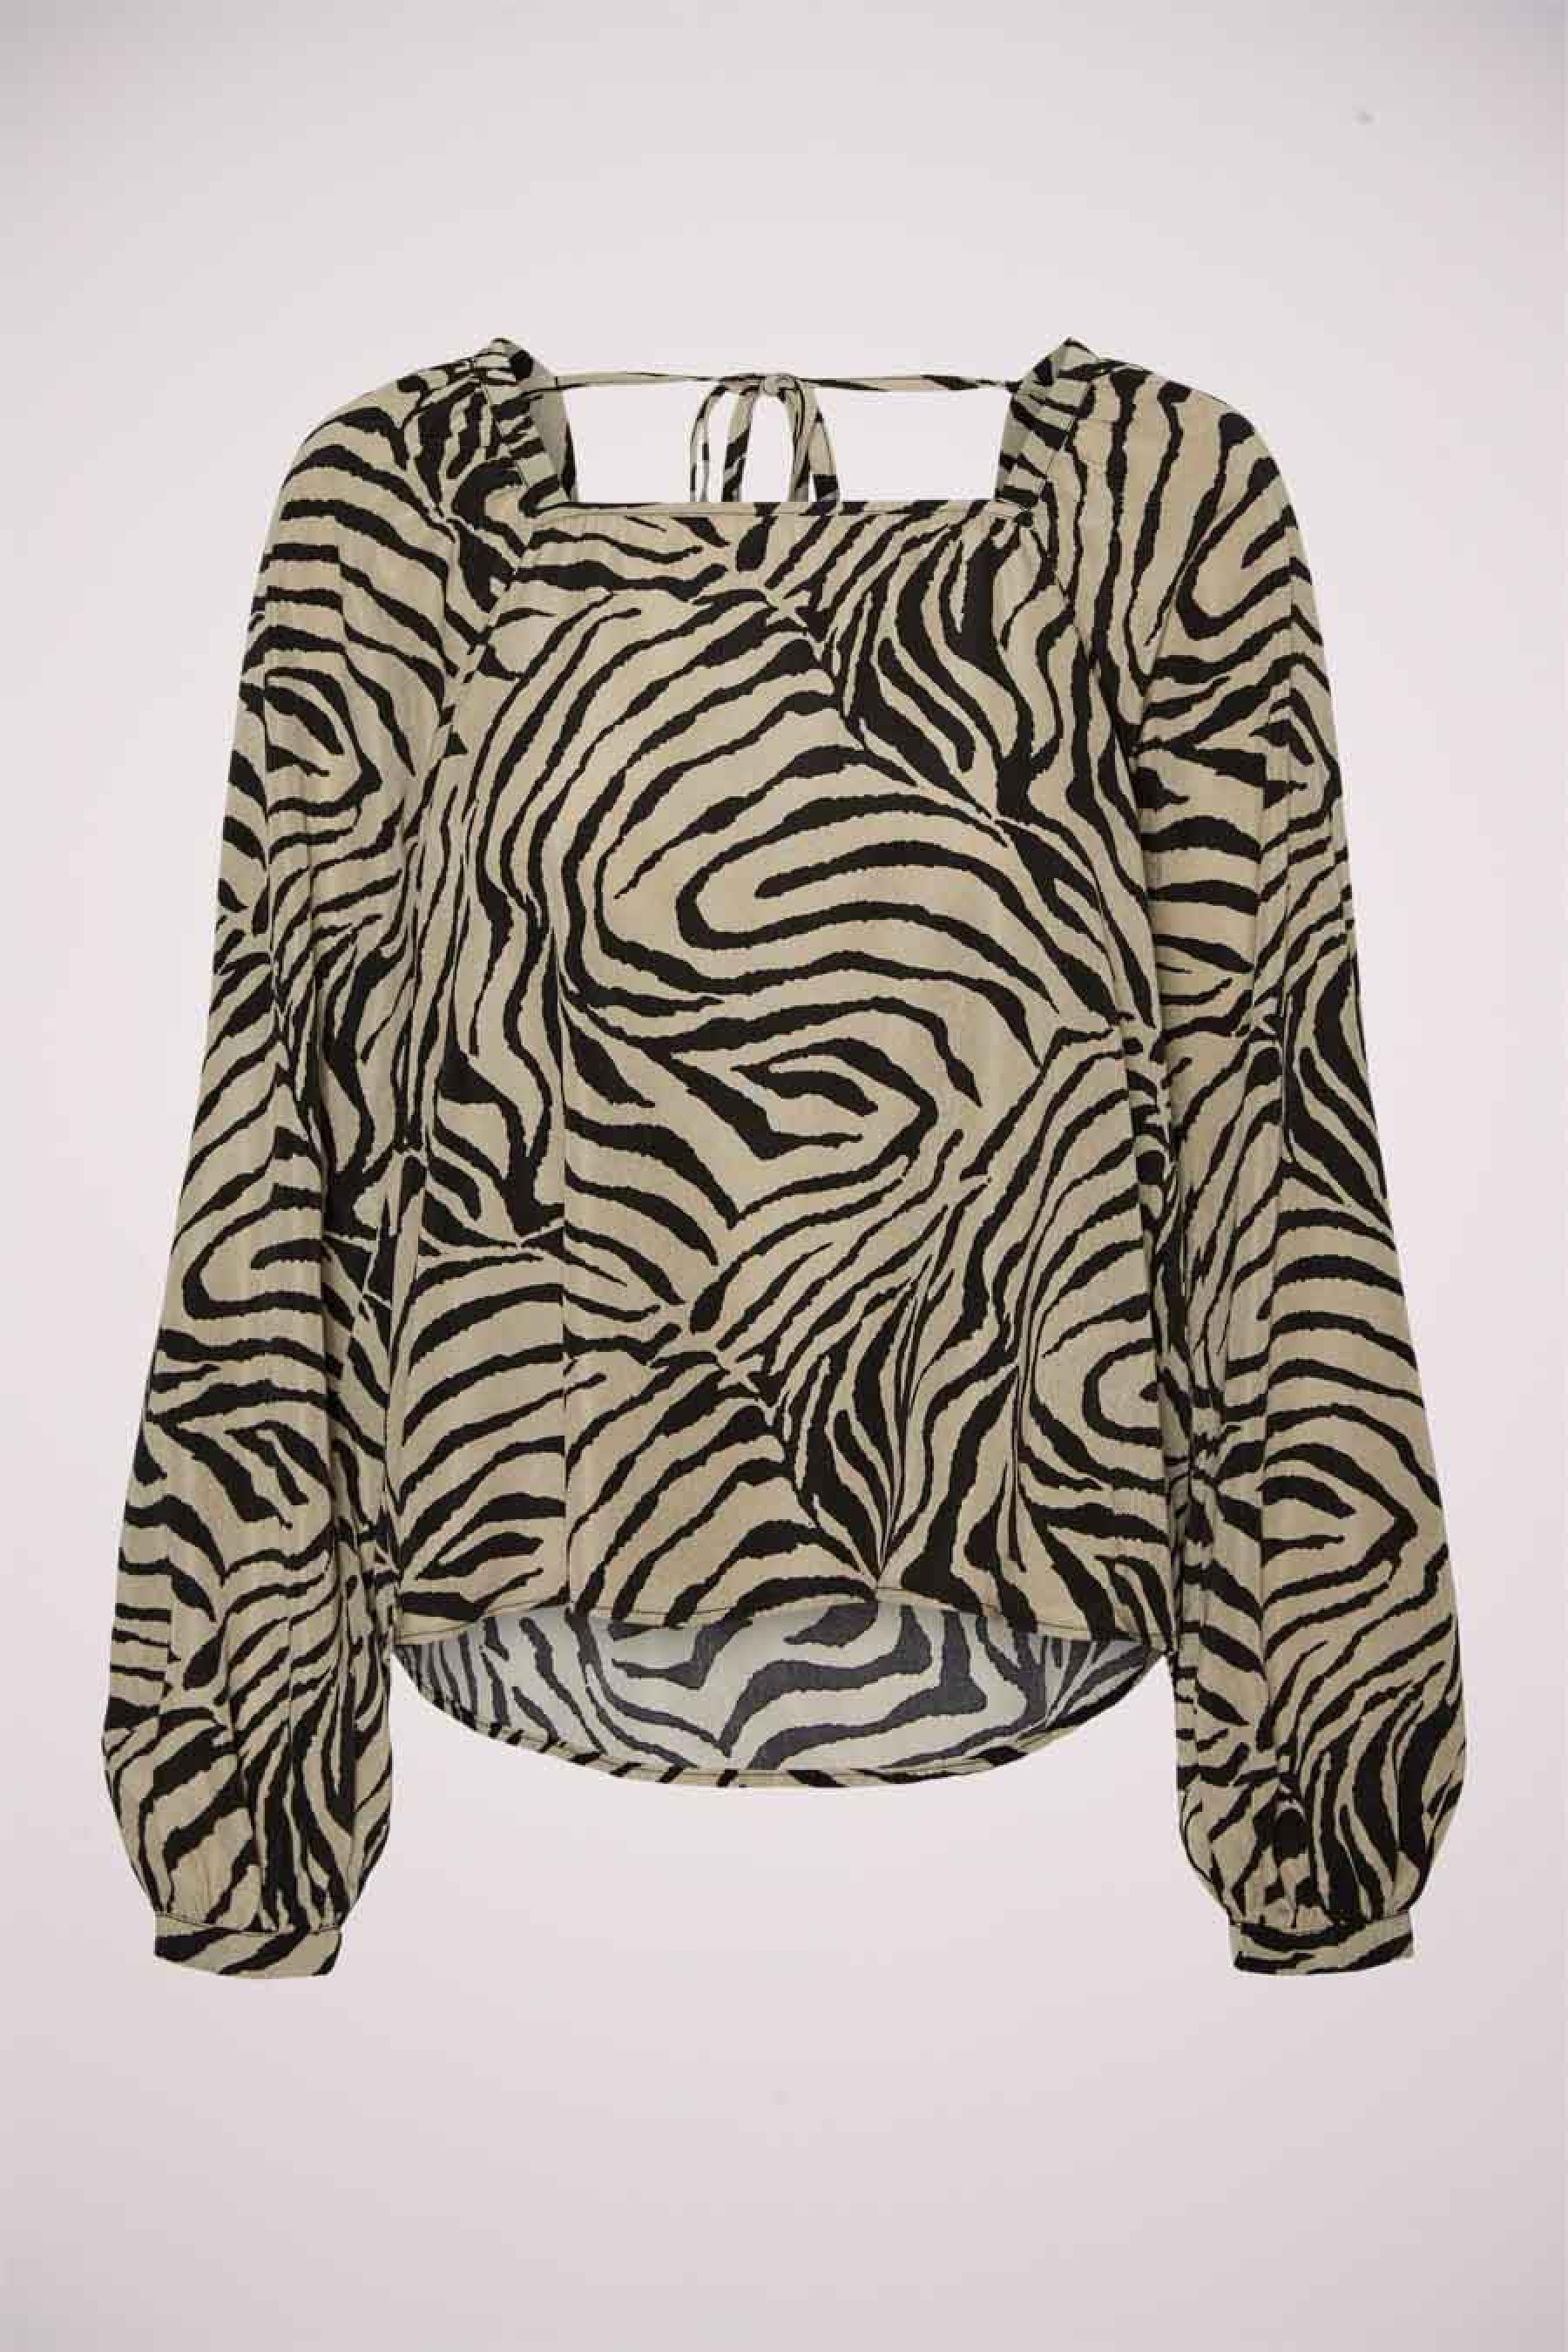 Vero Moda® Blouse lange mouwen, Multicolor, Dames, Maat: S/XS